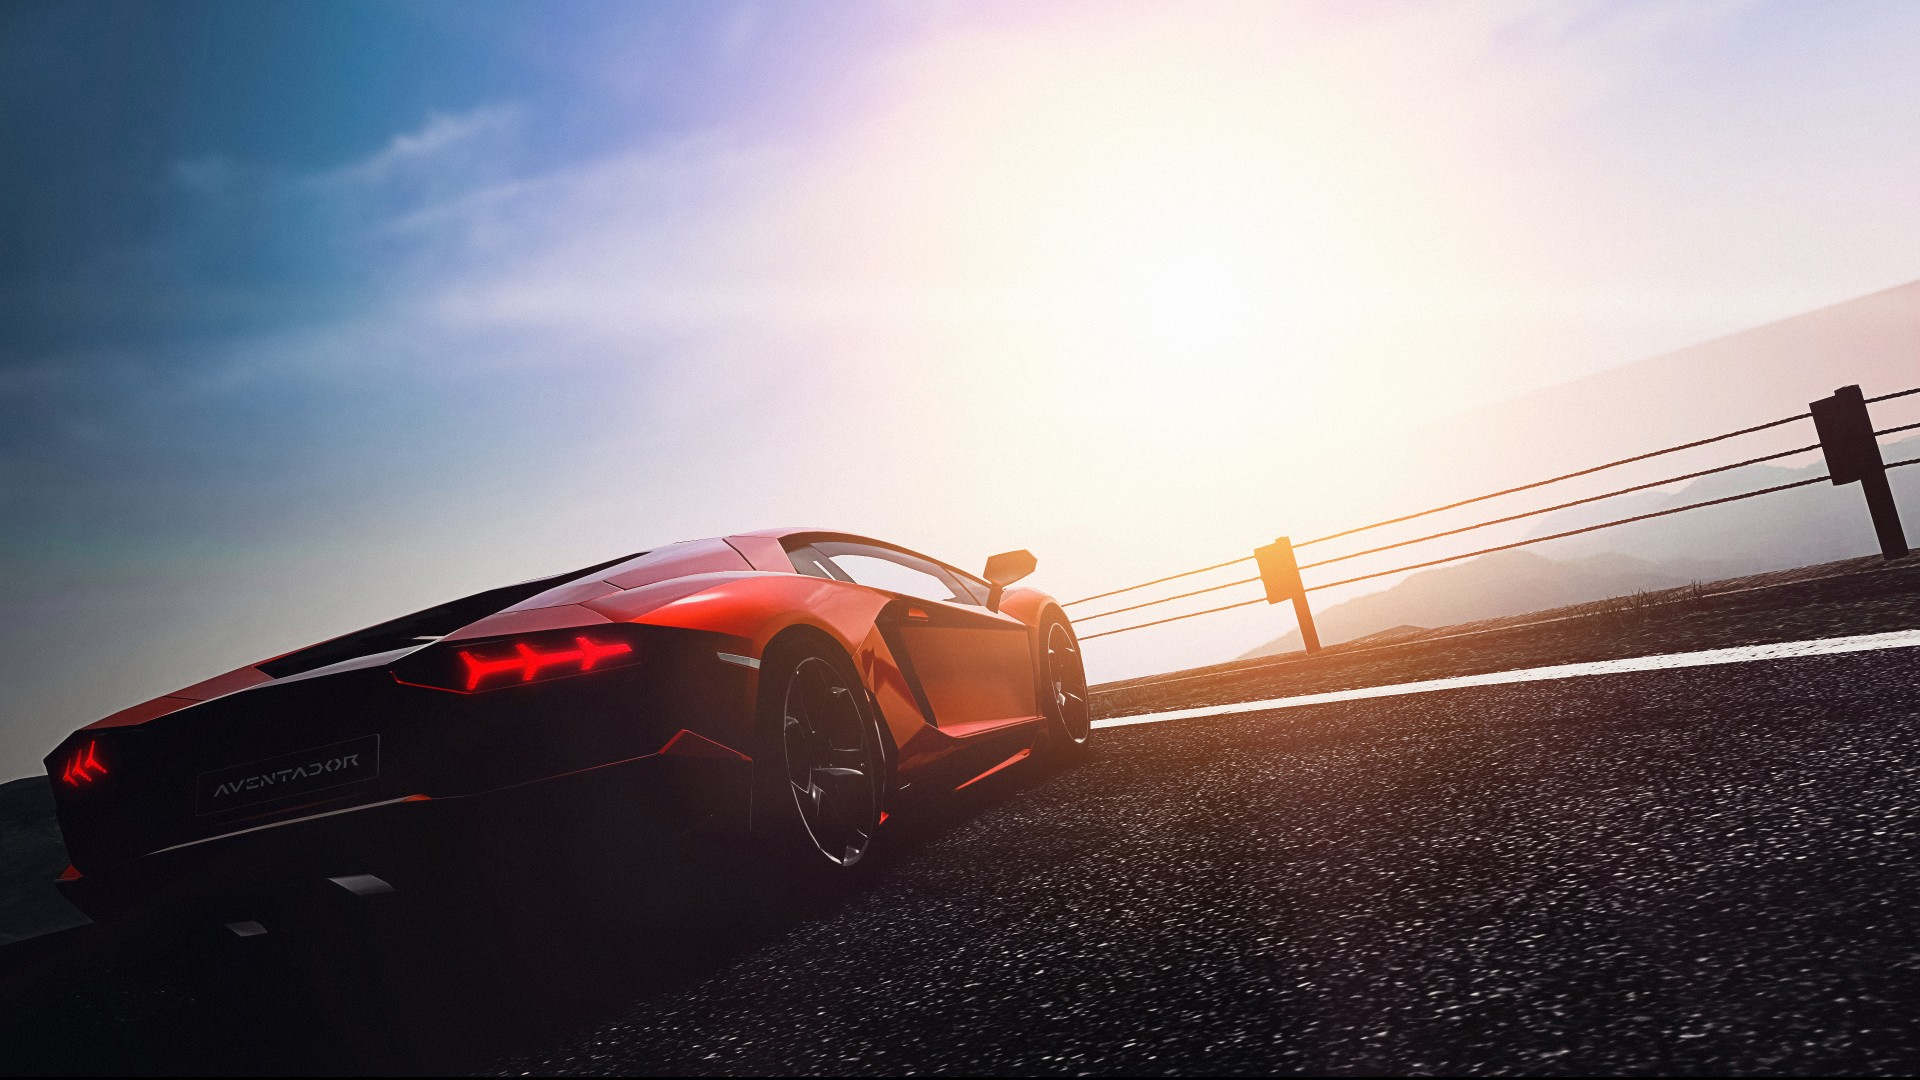 Lamborghini Aventador LP 700 4 Gran Turismo 6 2 Wallpaper